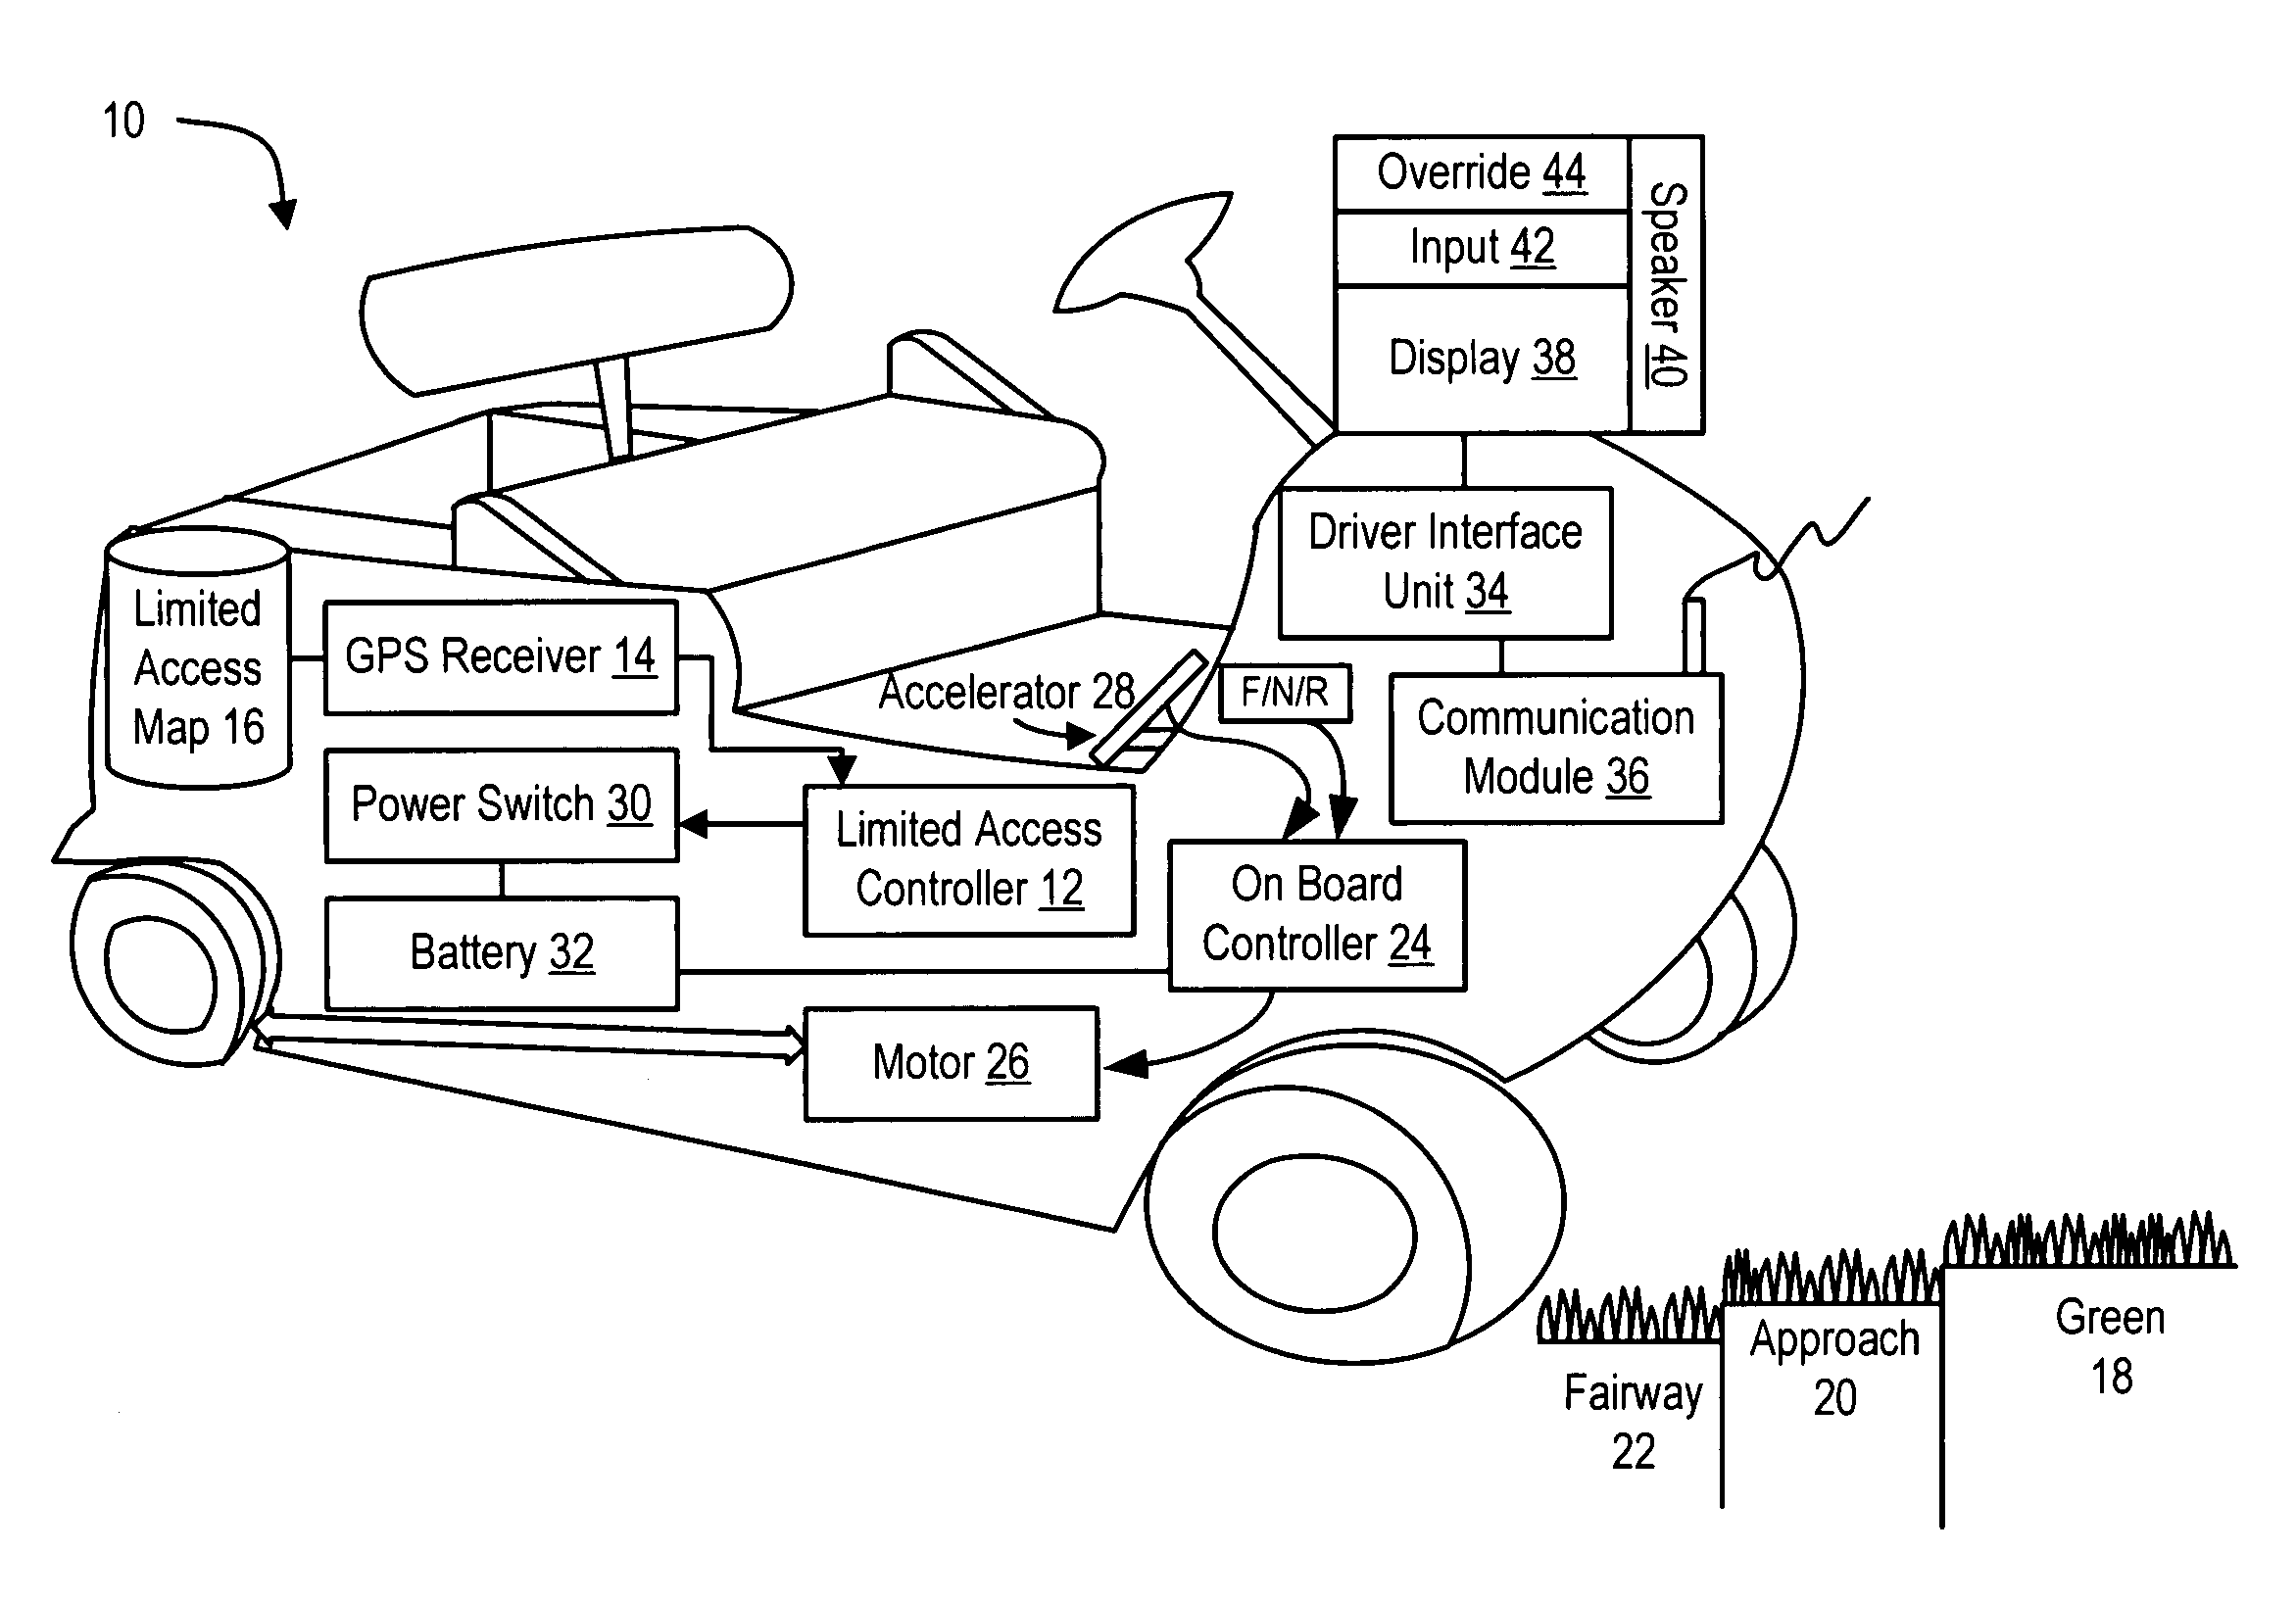 US07239965 20070703 D00000?resize\\\\\\\=665%2C463 36v ezgo textron wiring diagram ez golf cart wiring diagram, ezgo ezgo battery installation diagram at alyssarenee.co